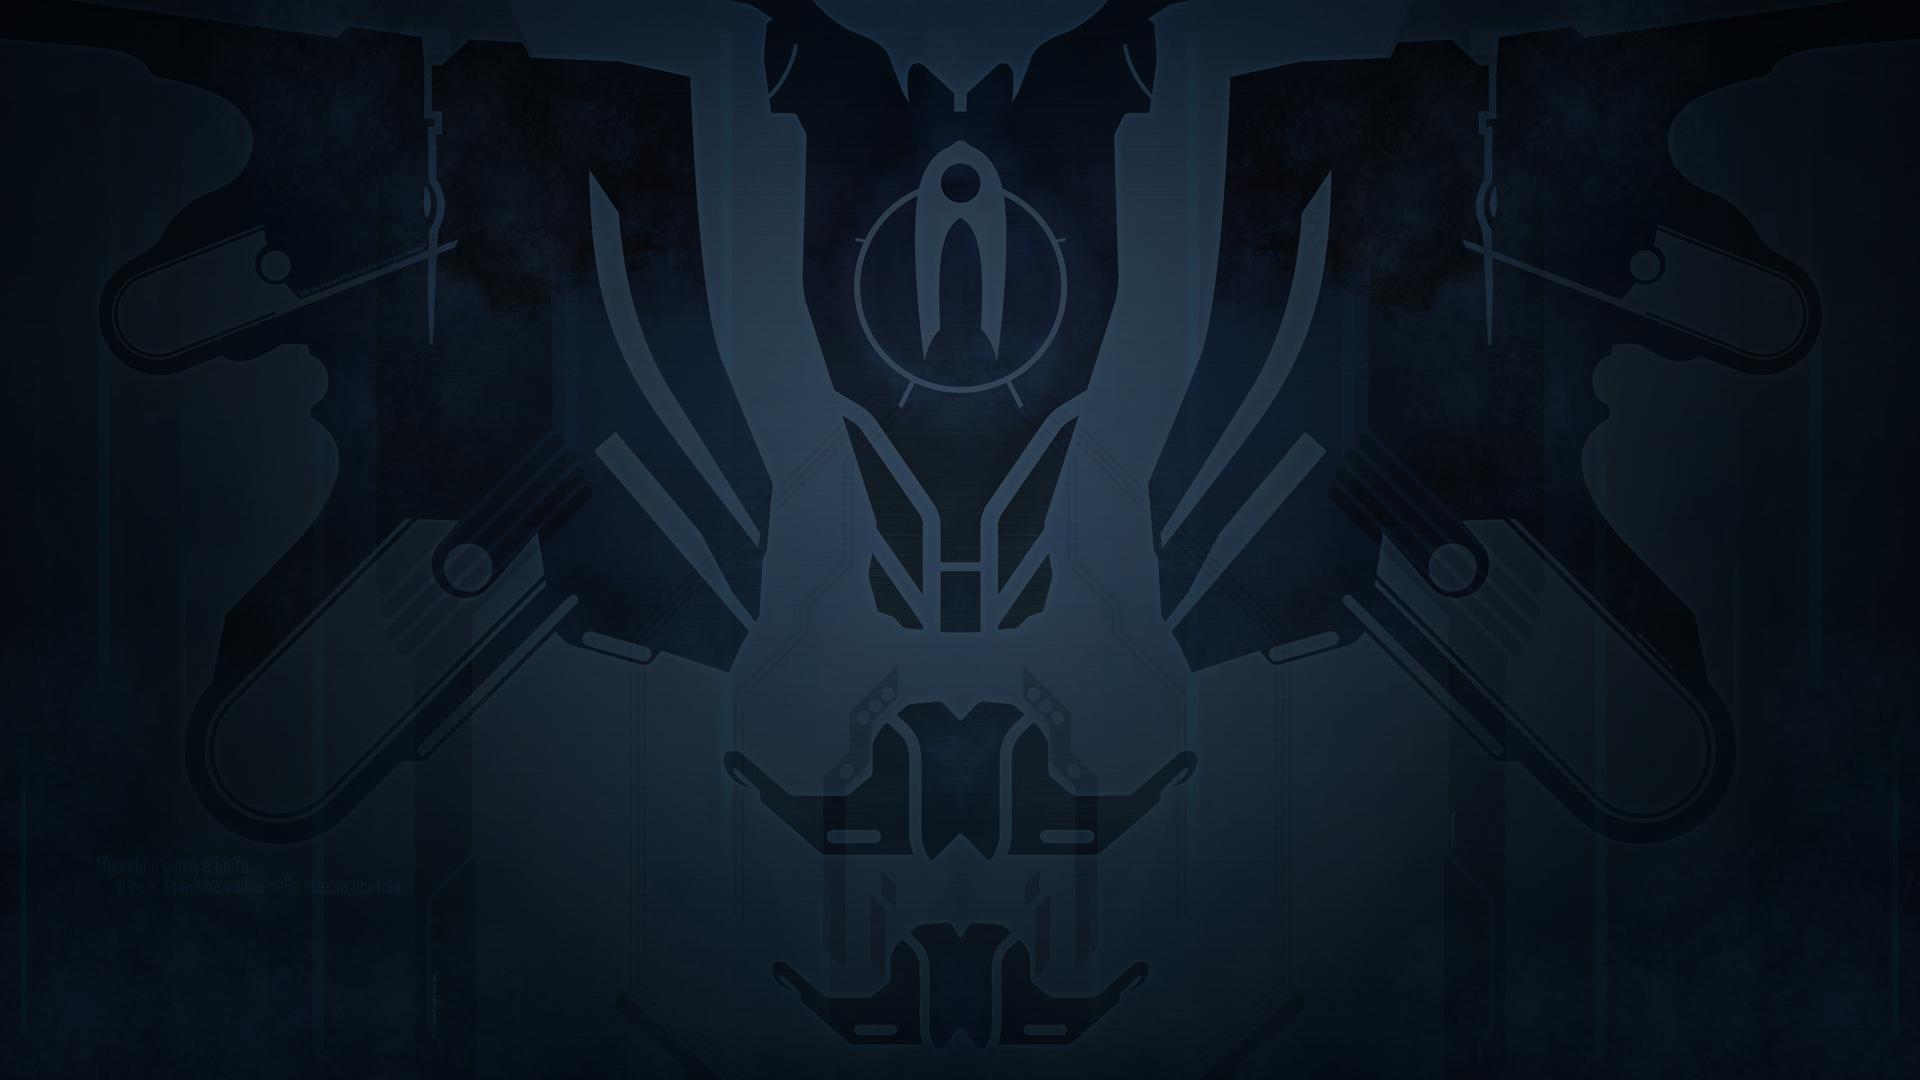 Halo 4 Cortana Wallpaper Dark by Beorn 1920x1080